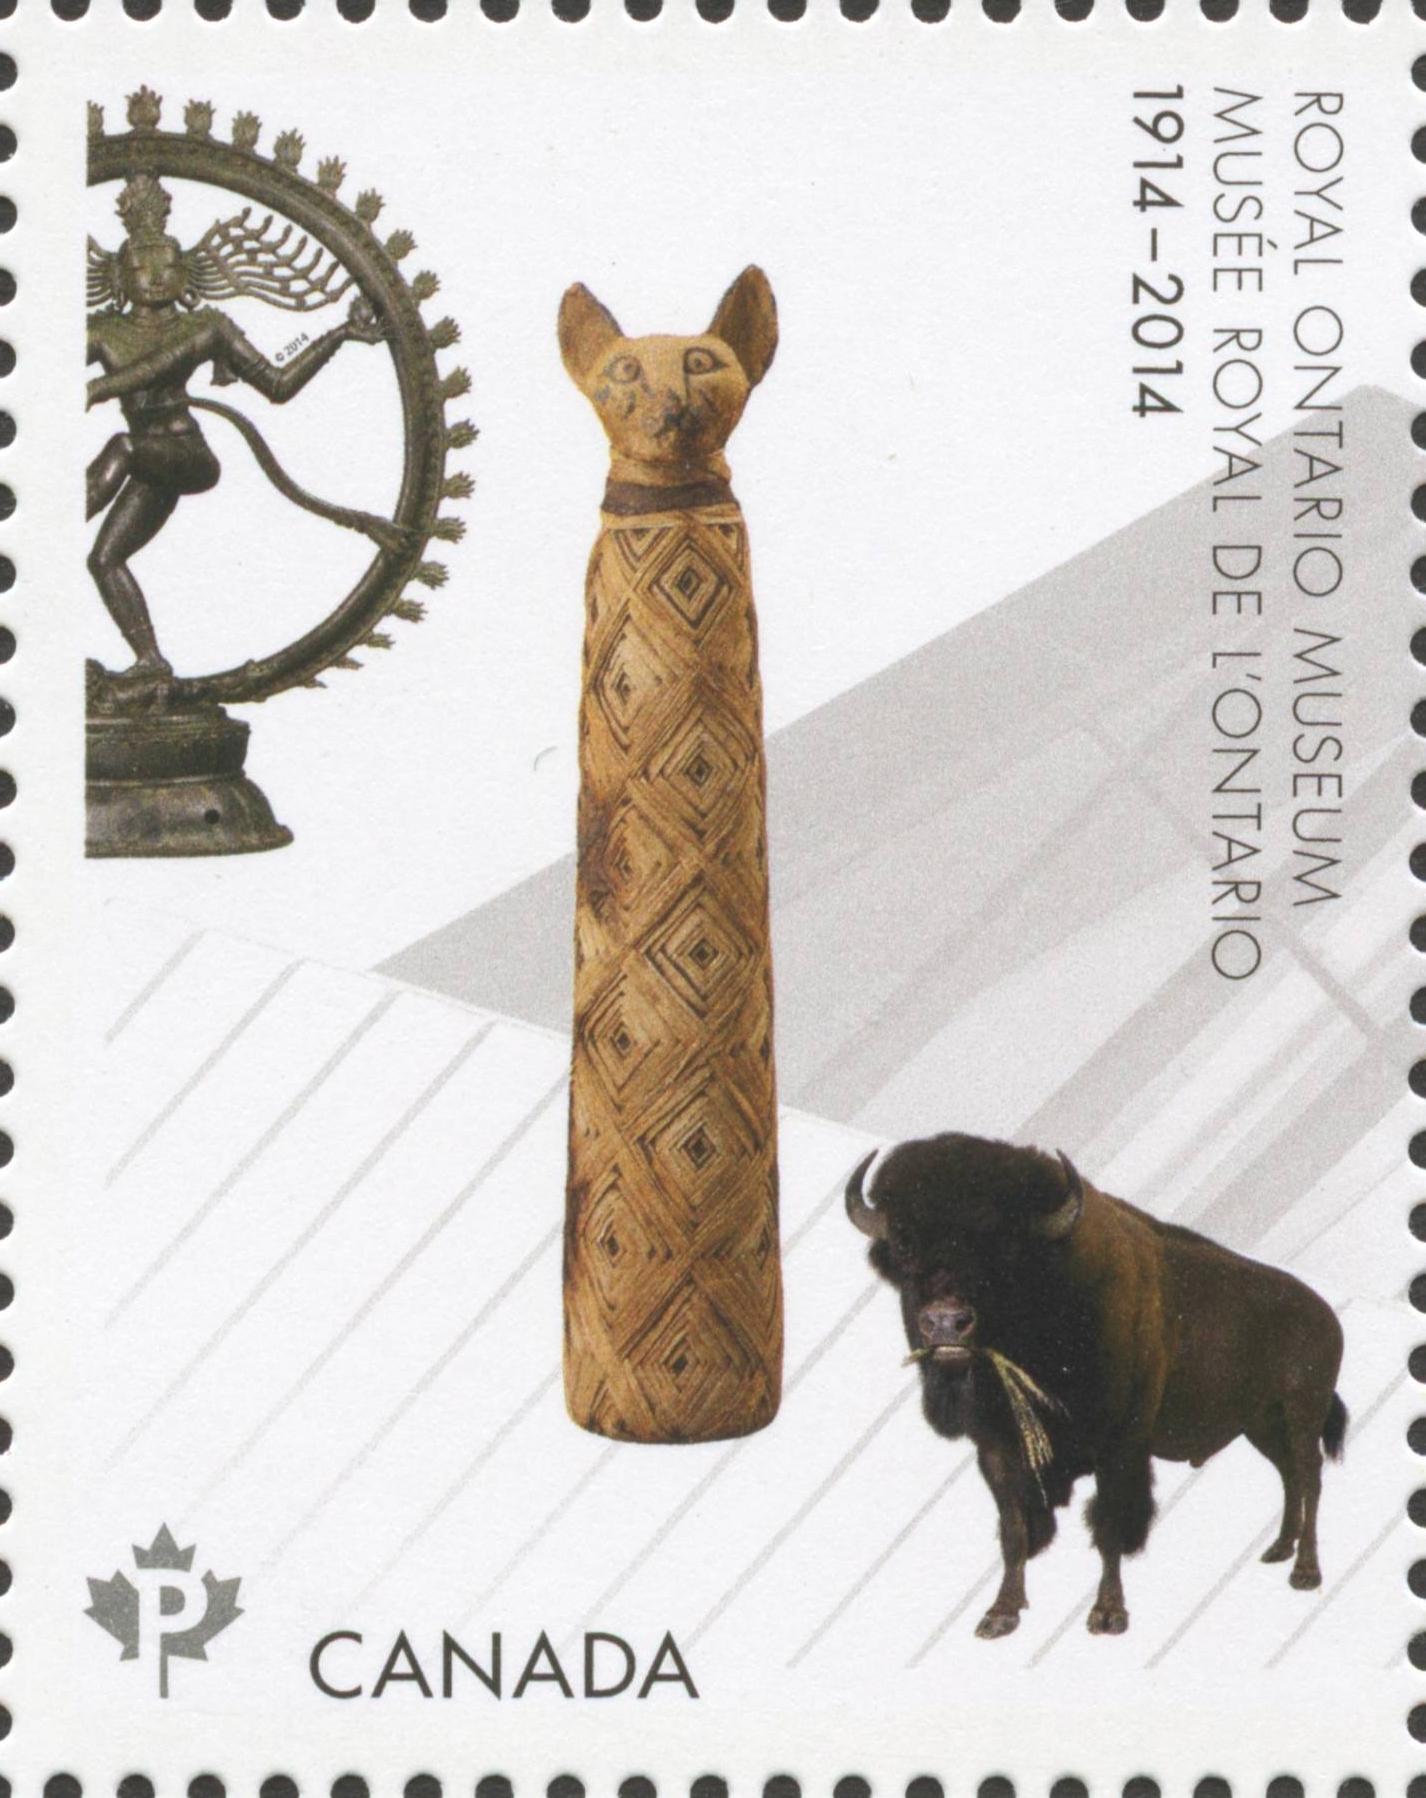 Royal Ontario Museum - Mummified Cat and the Shiva Natajara Sculpture  Canada Postage Stamp